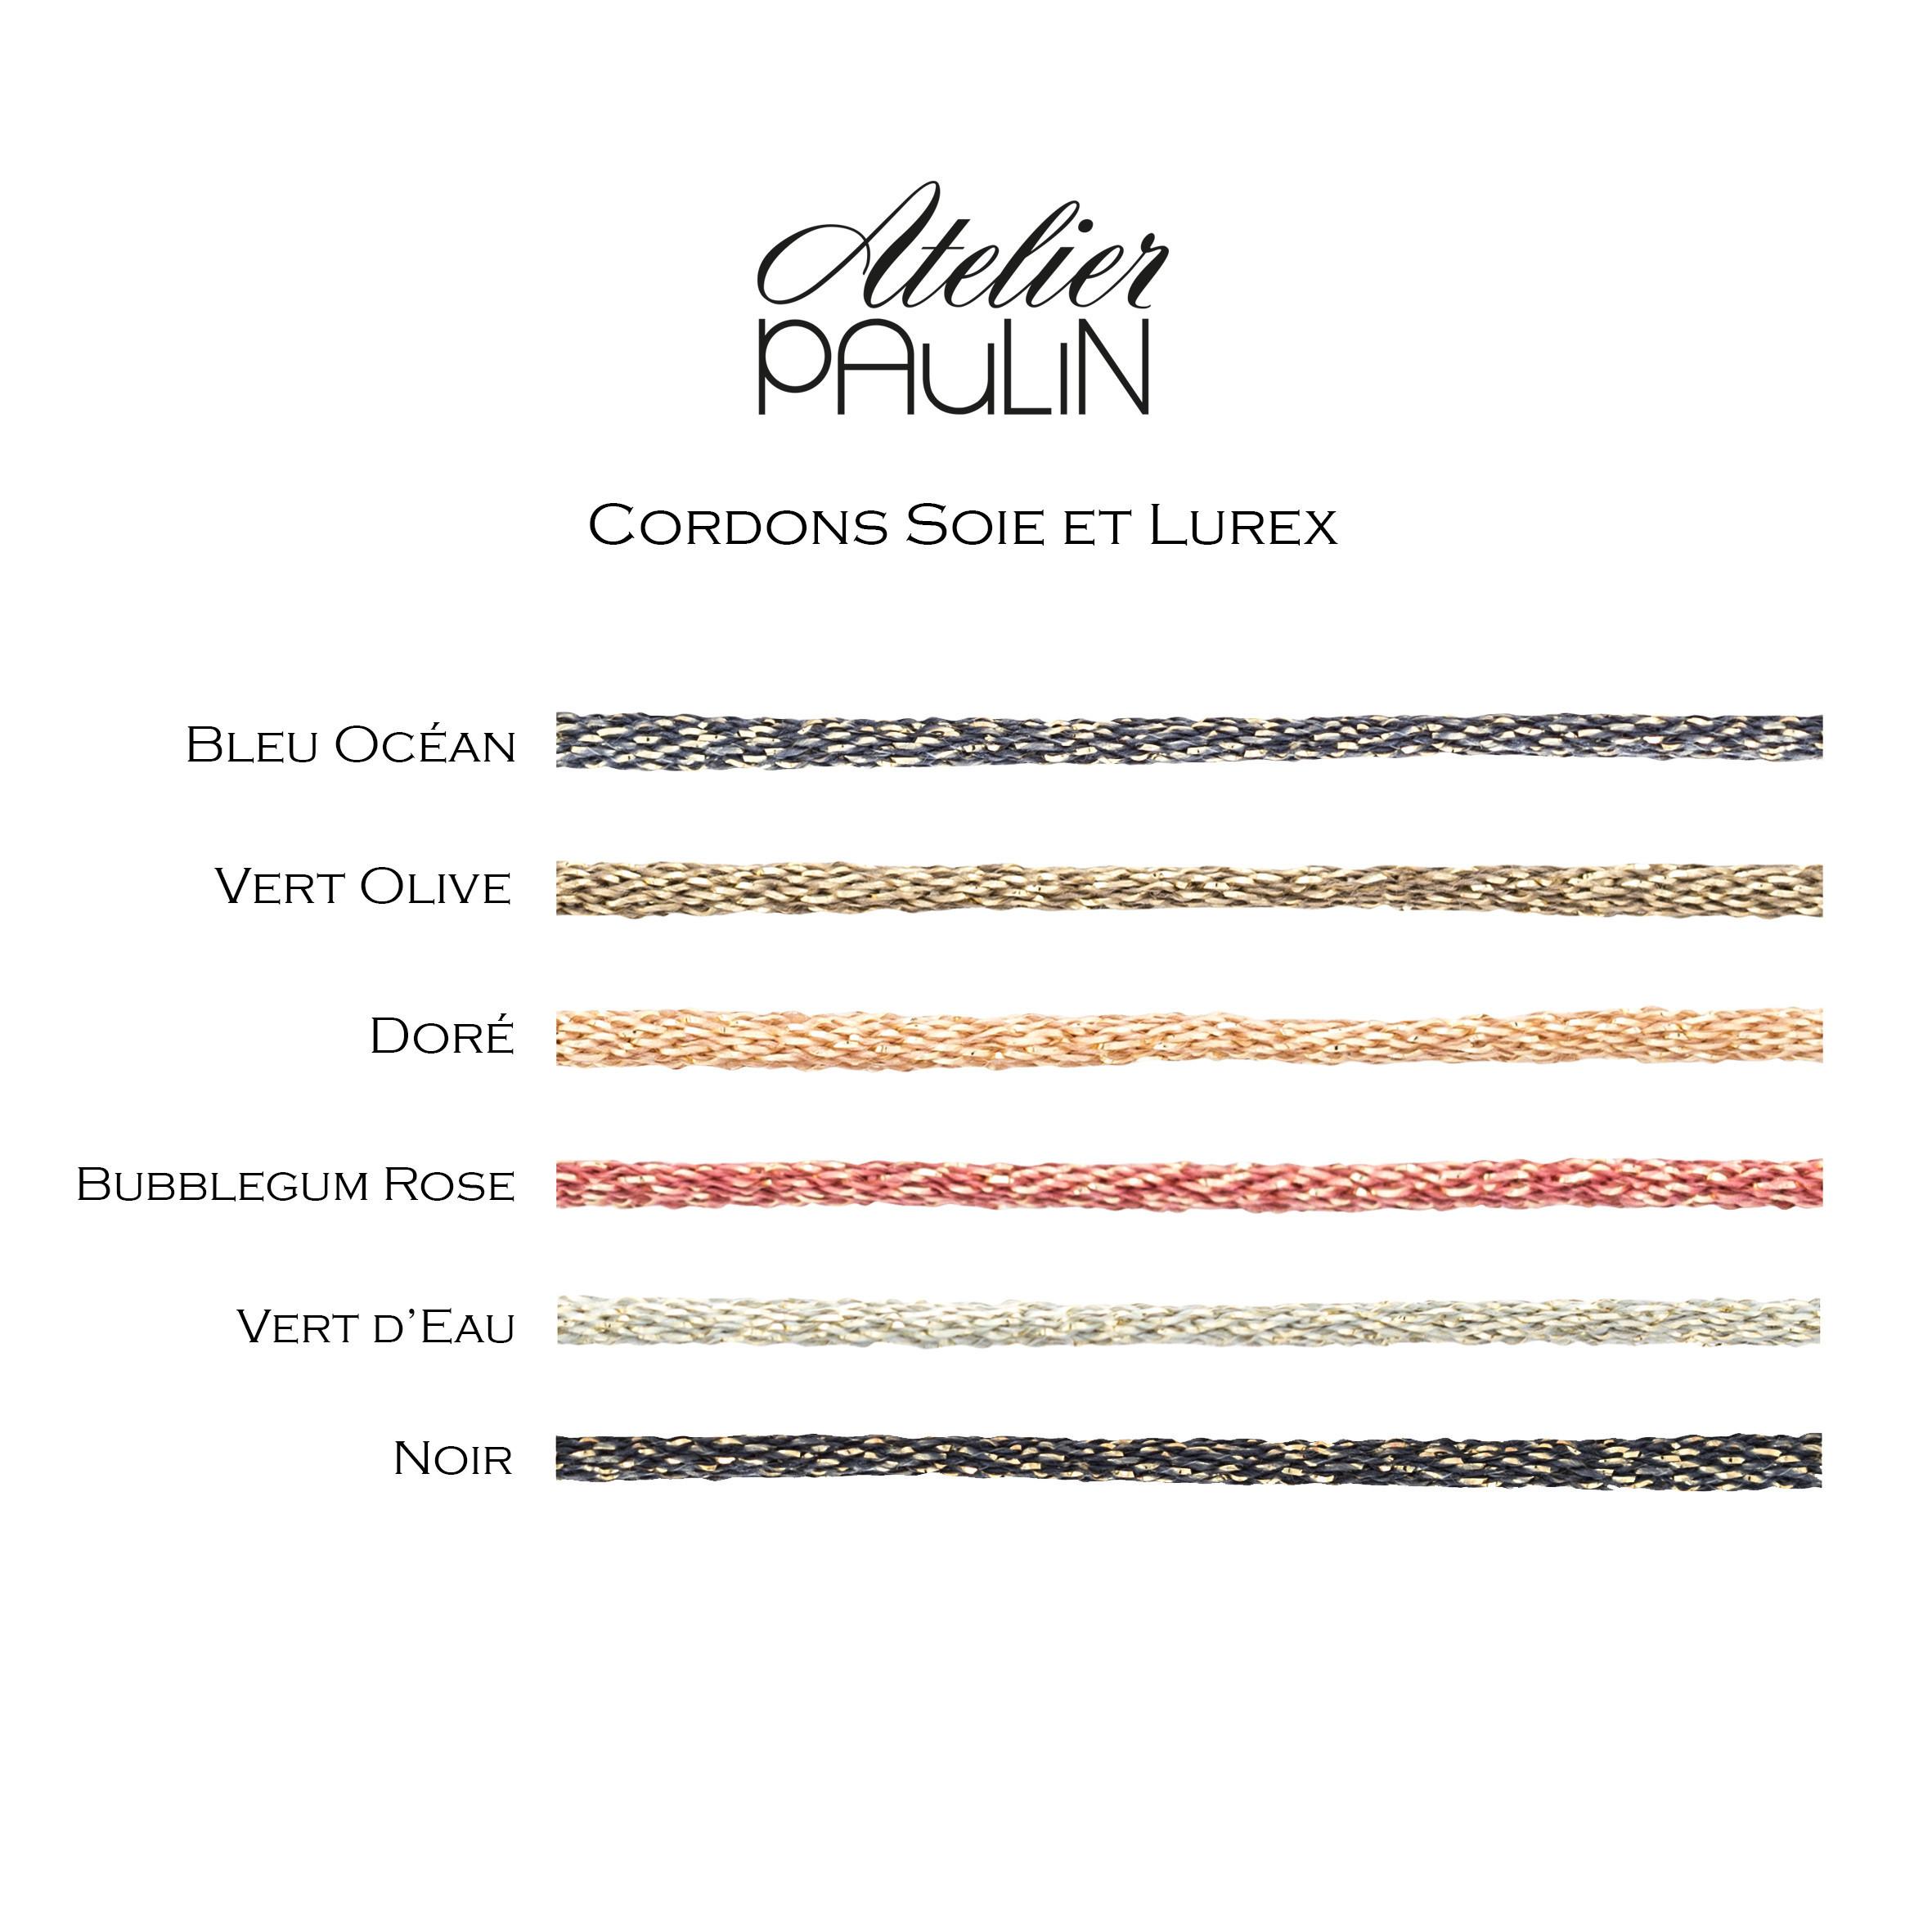 ATELIER PAULIN - Bracelet Cordon Lurex Personnalisable Gold Filled Or Rose